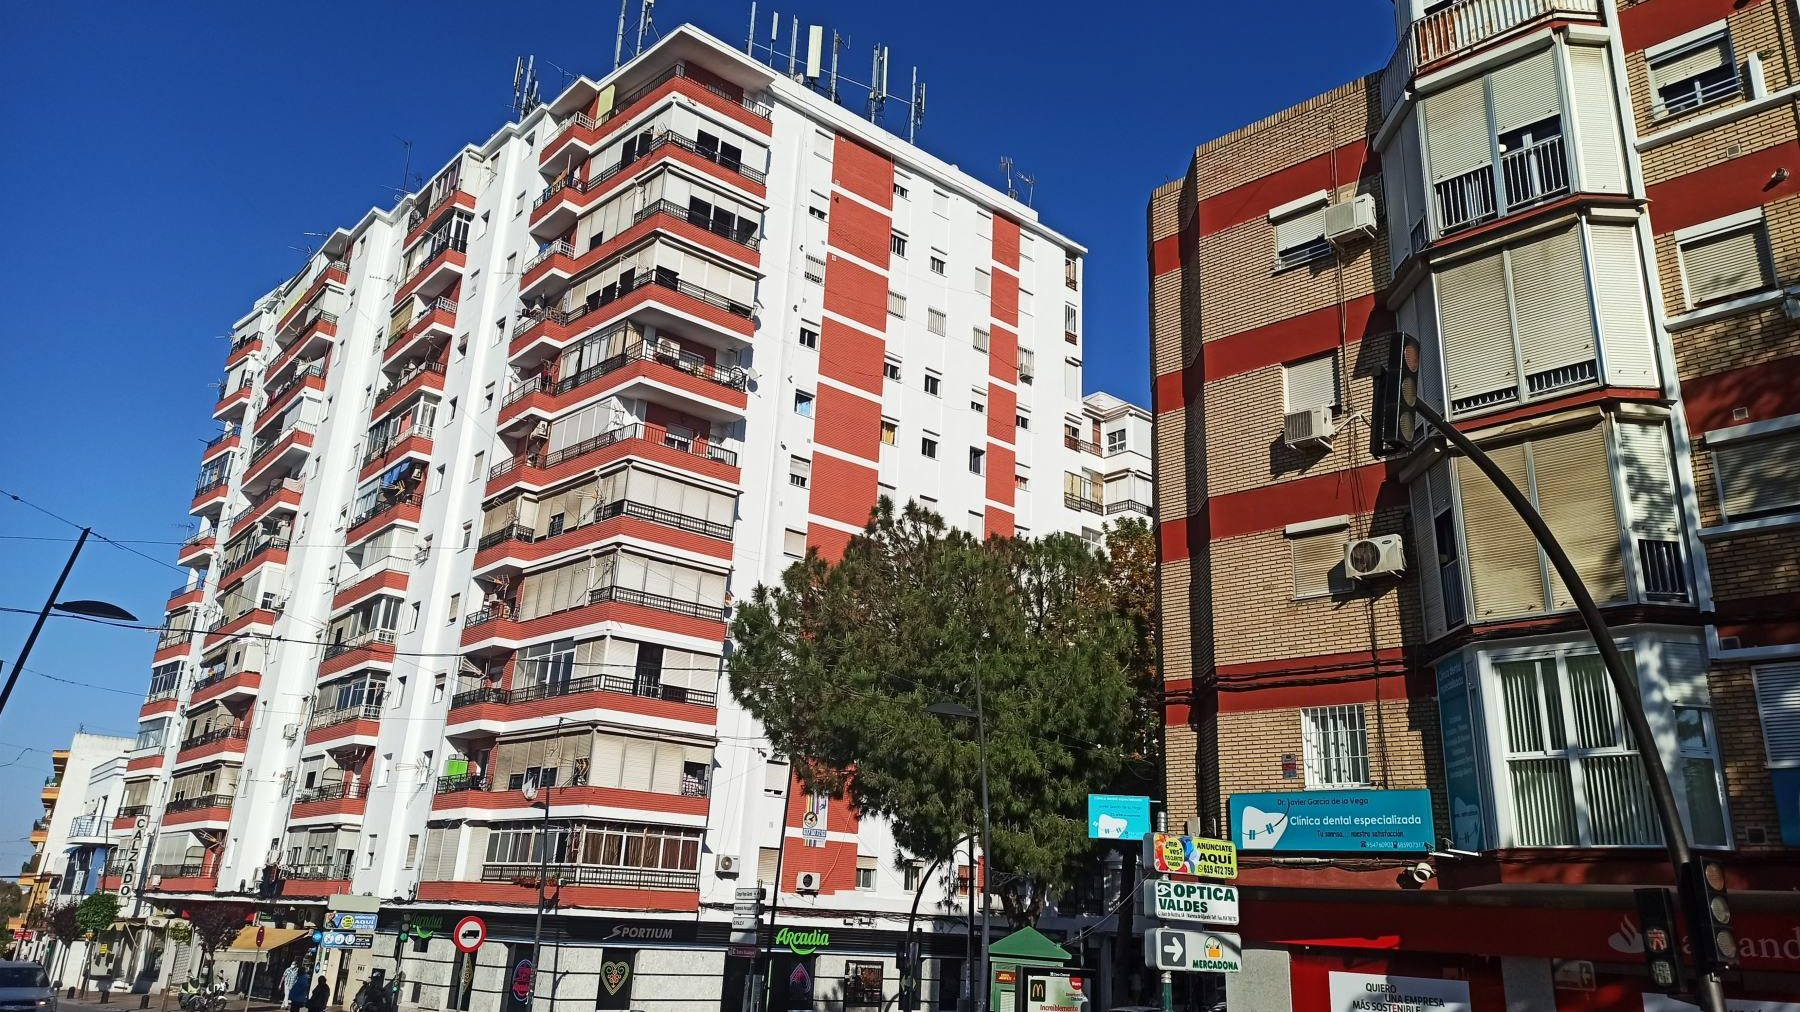 Bloques de viviendas en San Juan de Aznalfarache (EUROPA PRESS).